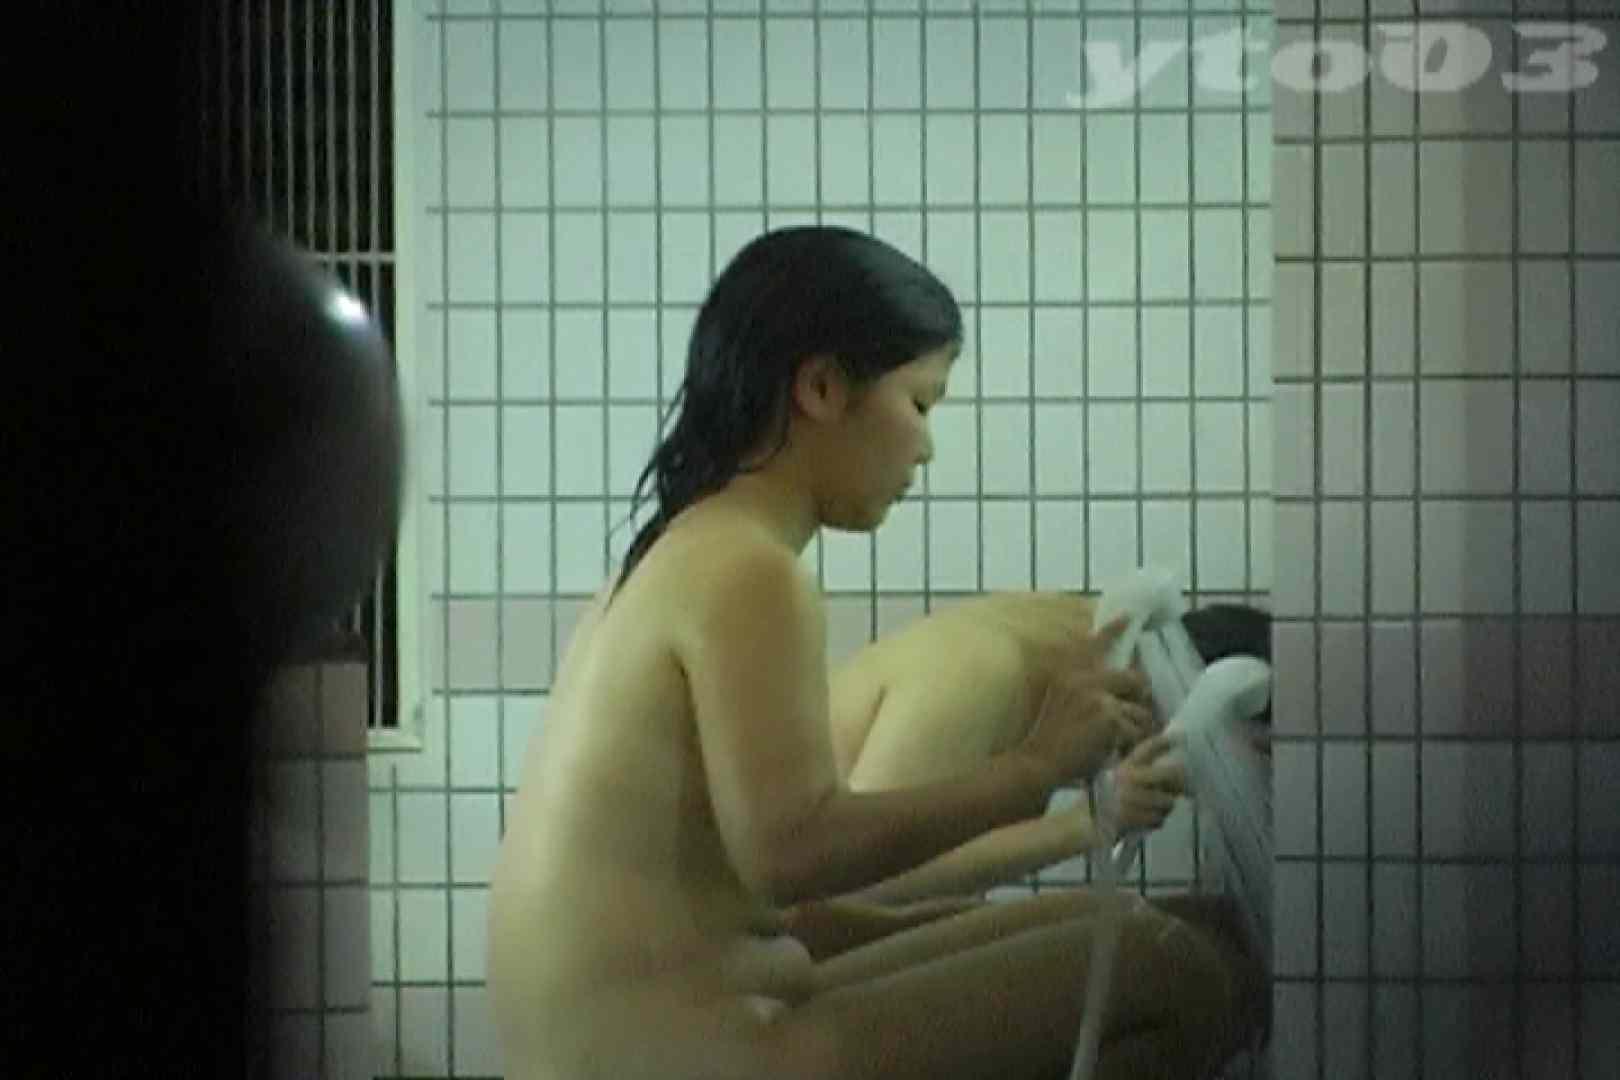 【期間限定配信】合宿ホテル女風呂盗撮 Vol.16 合宿中の出来事 戯れ無修正画像 85画像 7